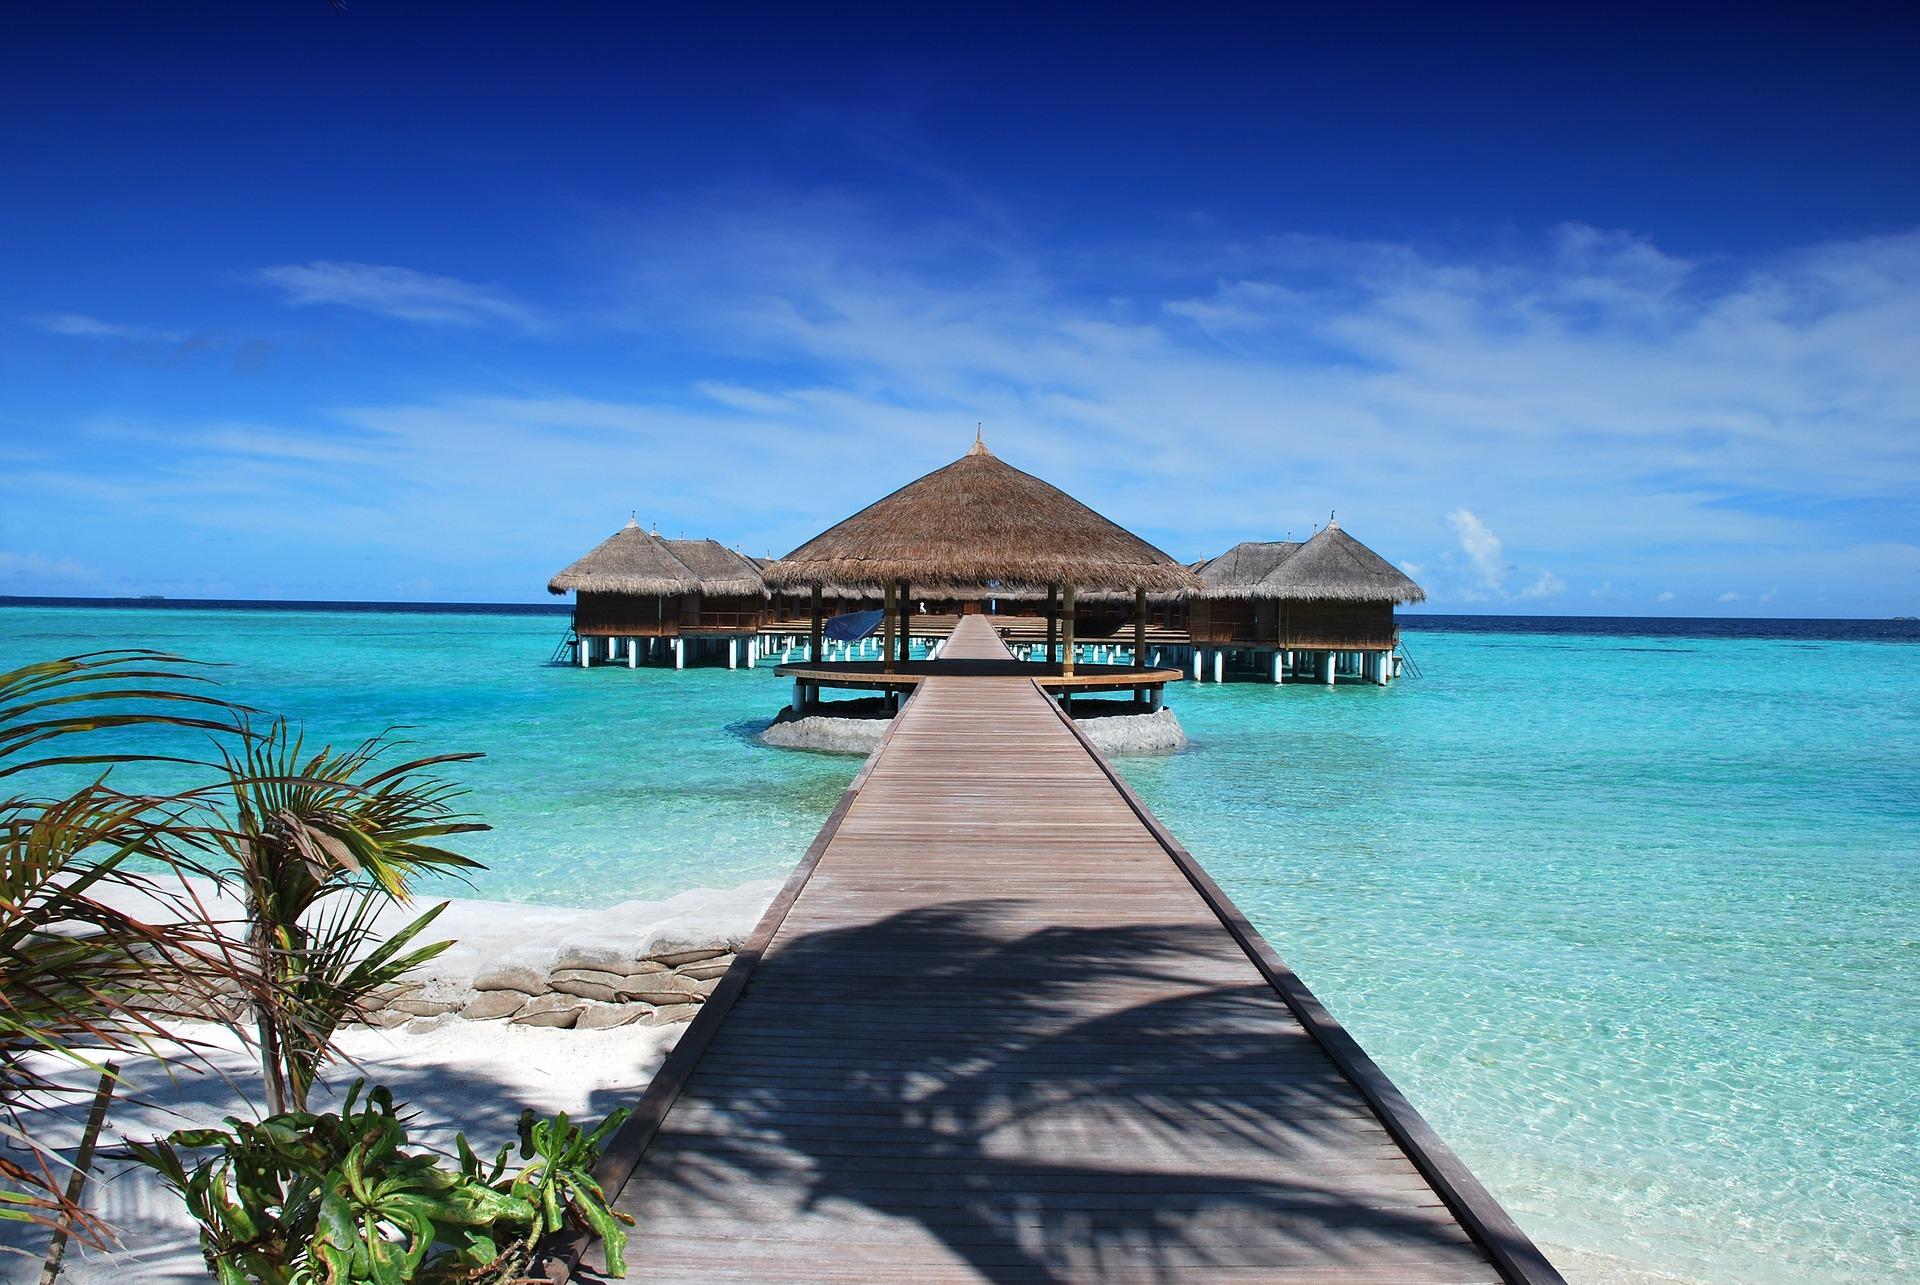 Malediven Urlaub im Beachbungalow ist Glamping !